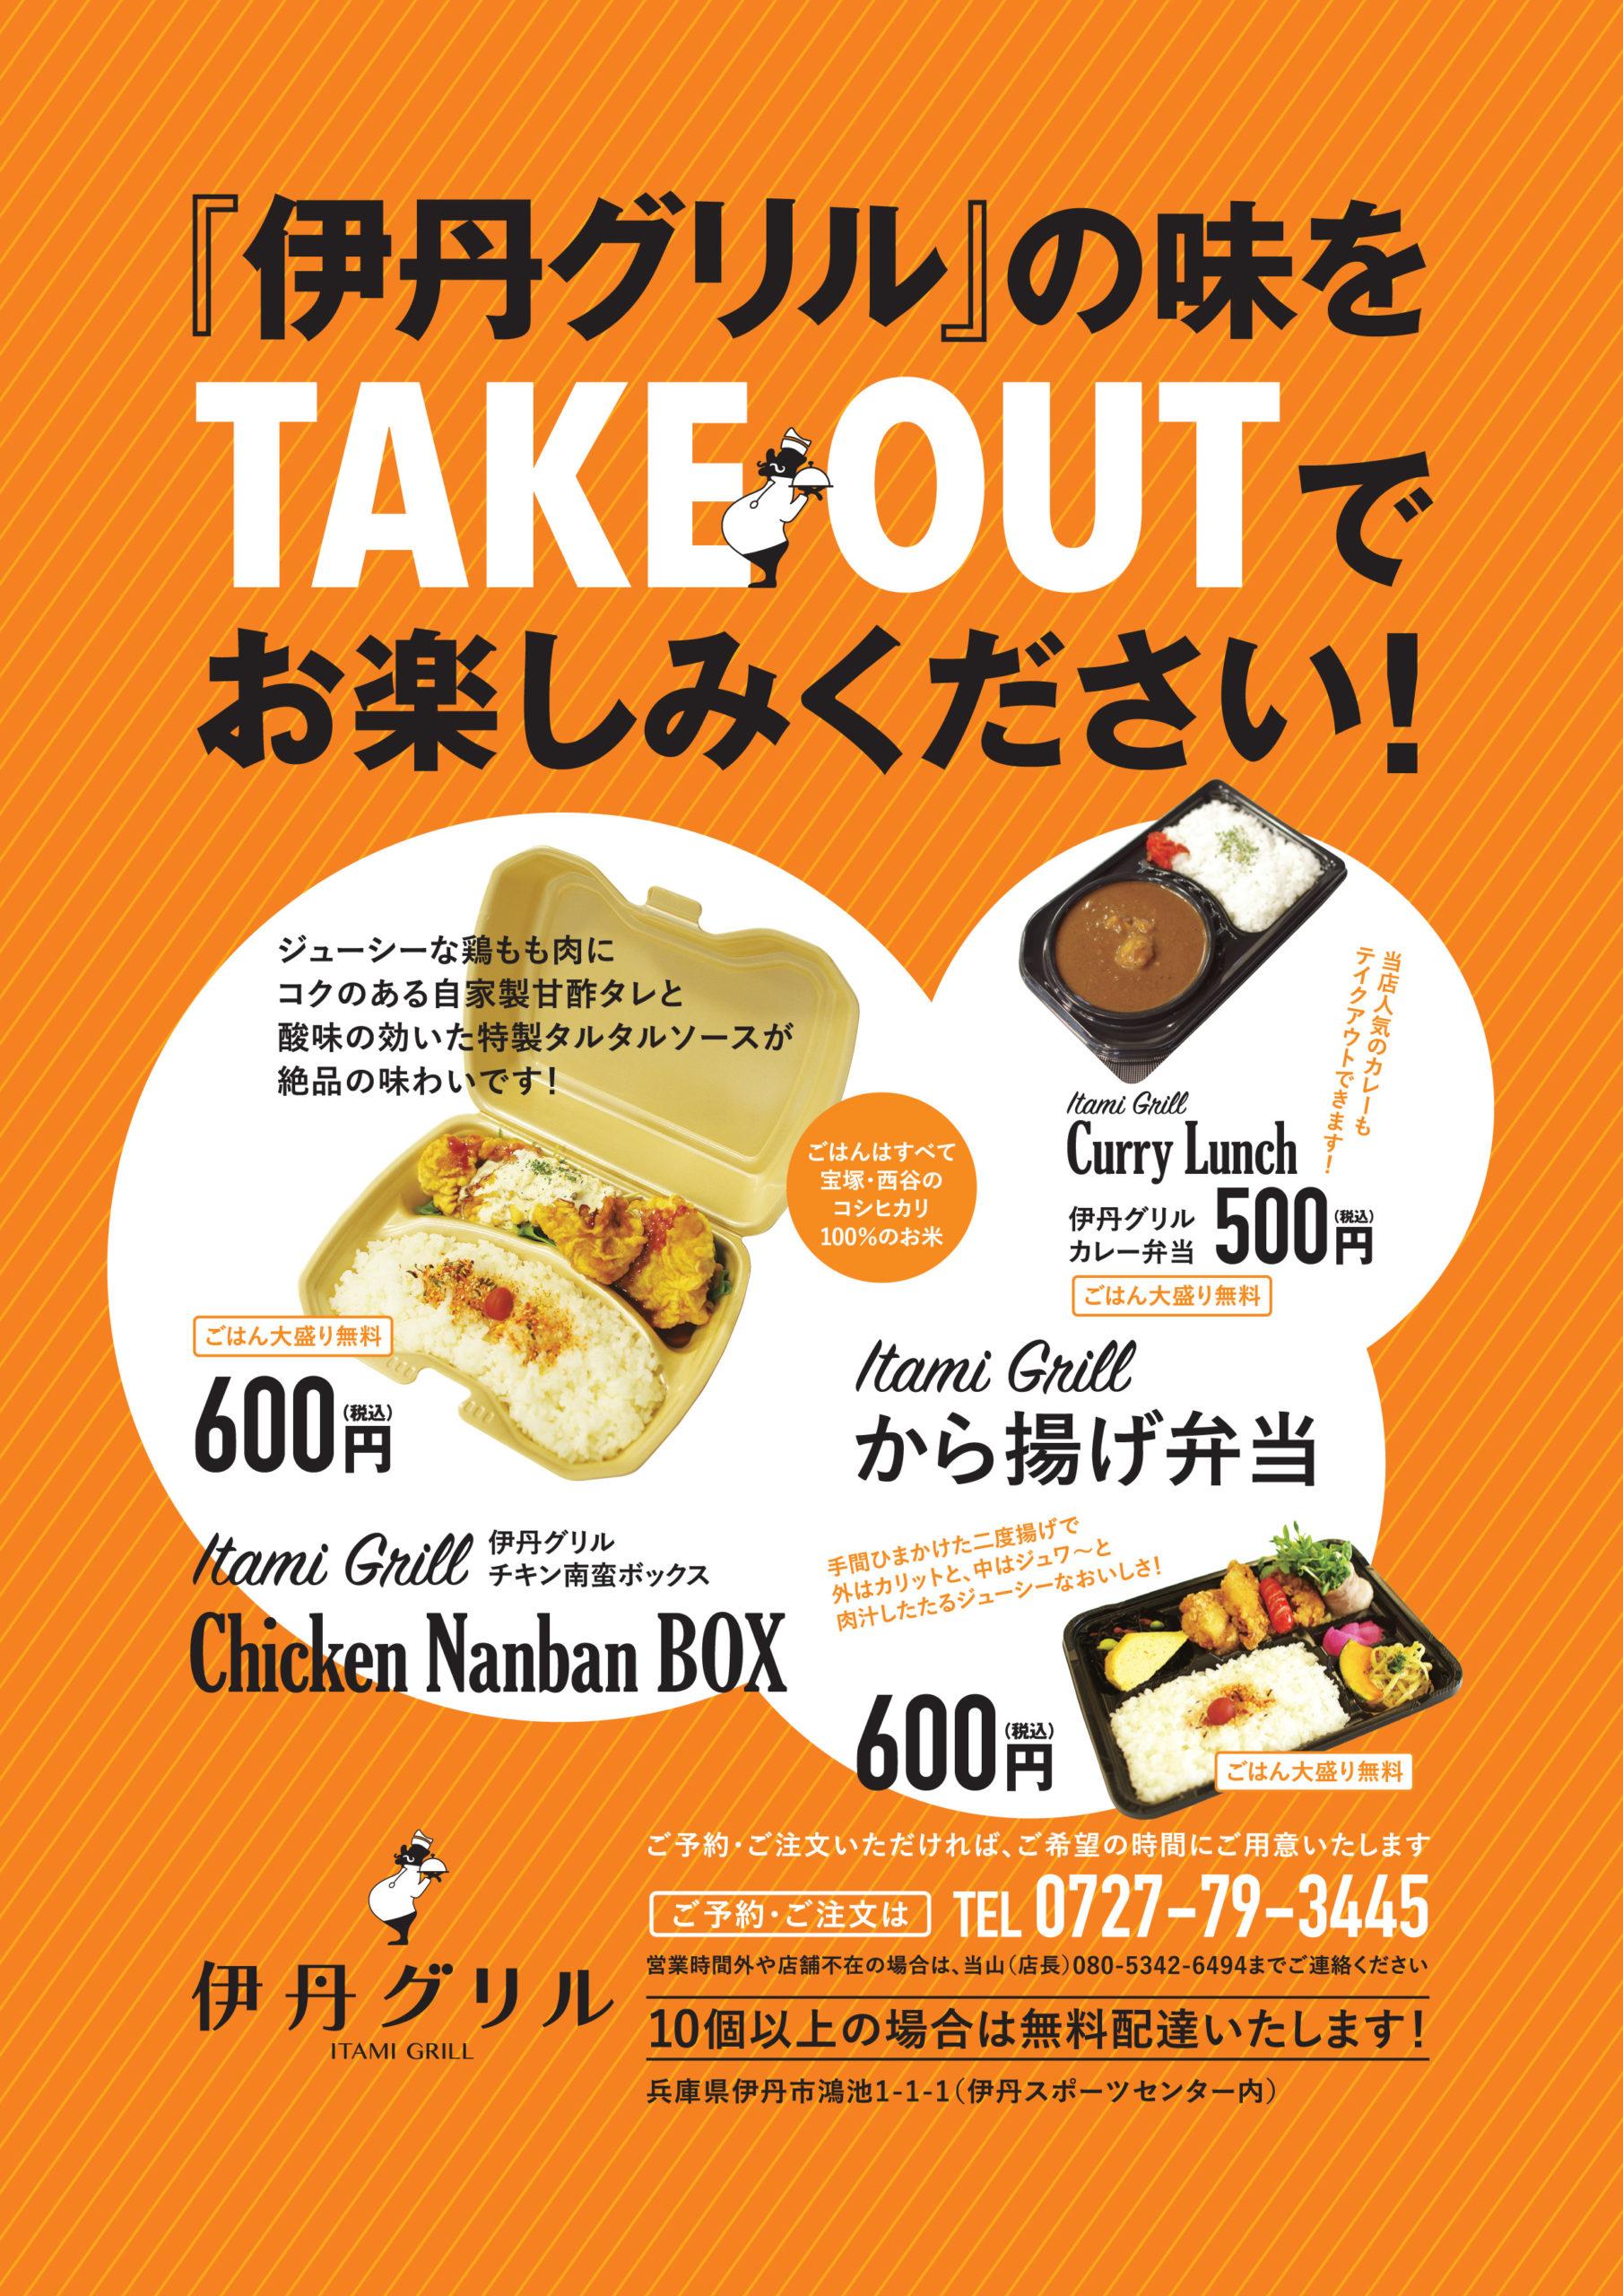 2020_TR_lunchbox-itami_0419